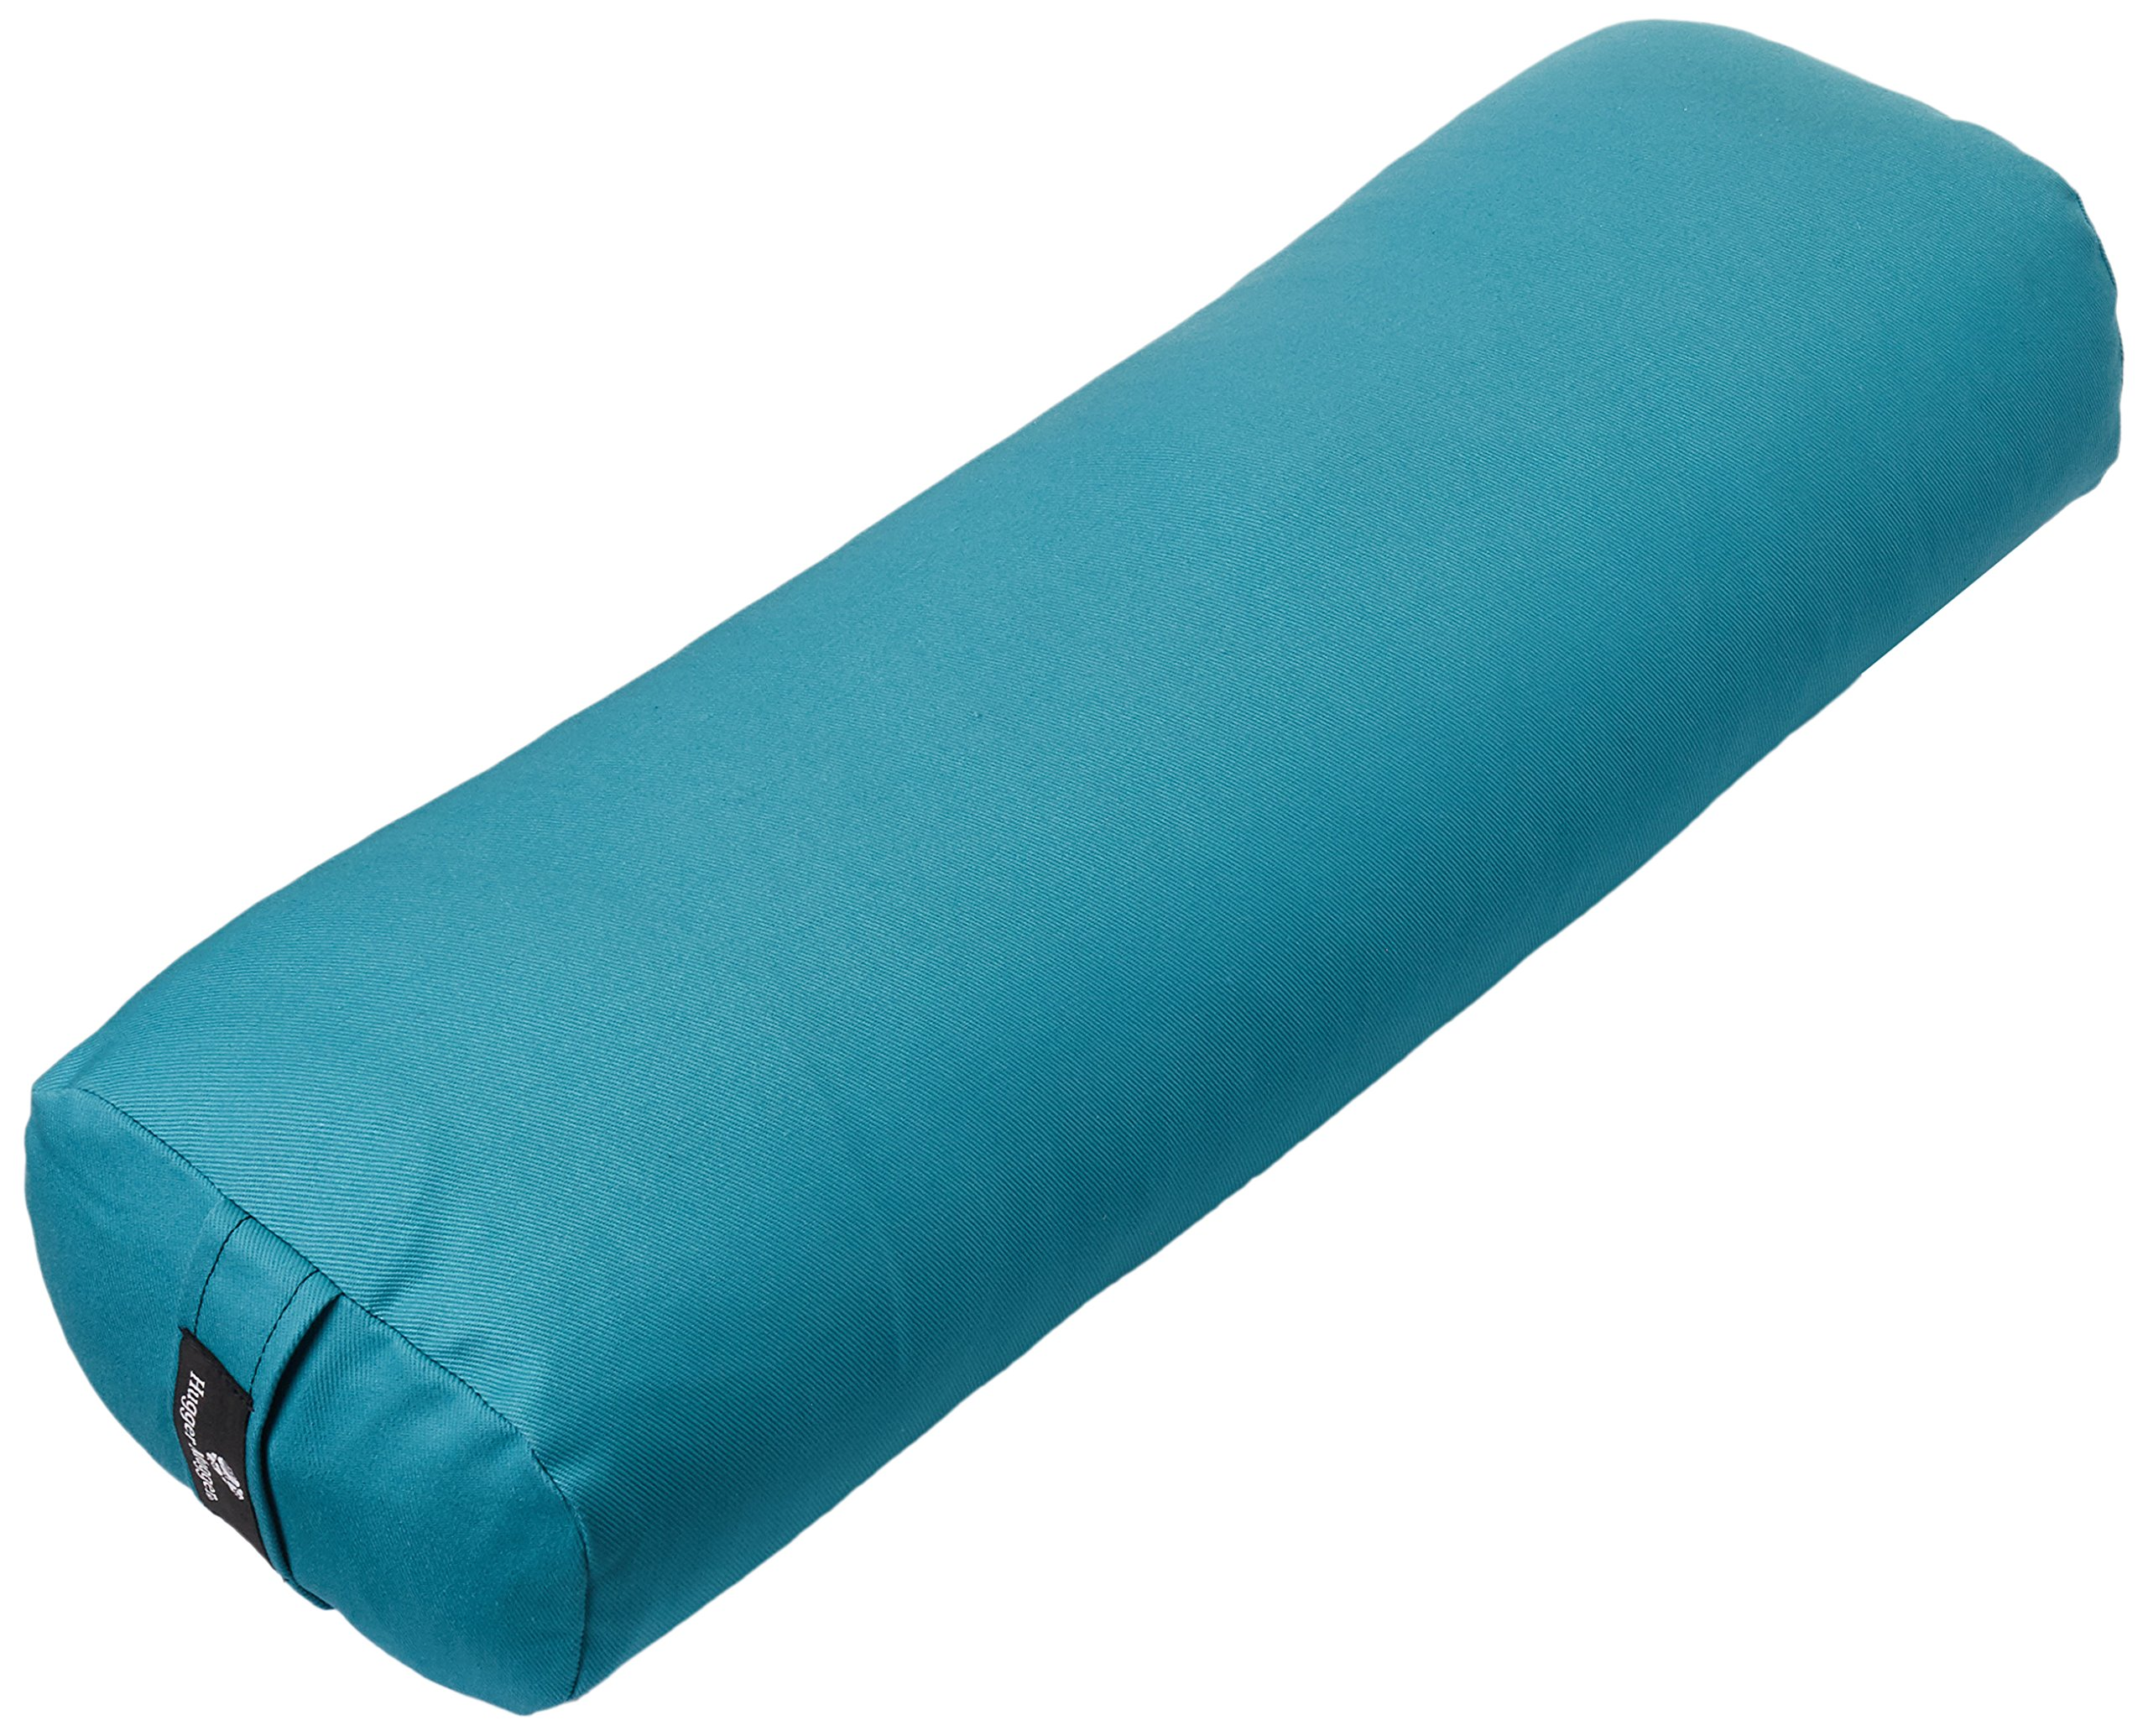 Hugger Mugger Standard Junior Yoga Bolster, Aqua